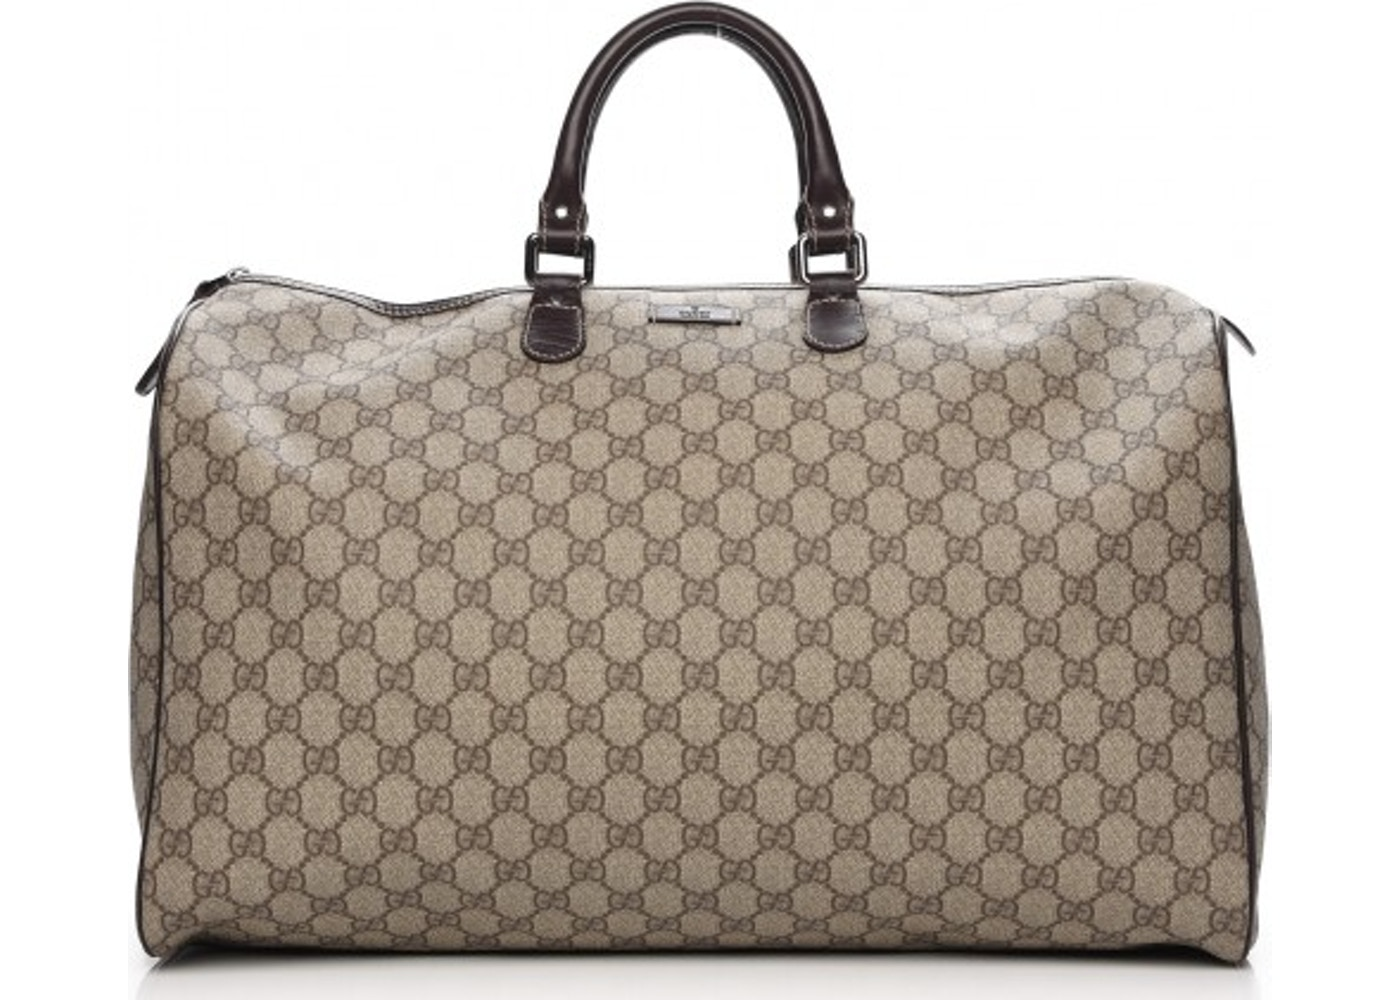 4131053dd71 Gucci Plus Duffle Monogram GG Large Dark Brown